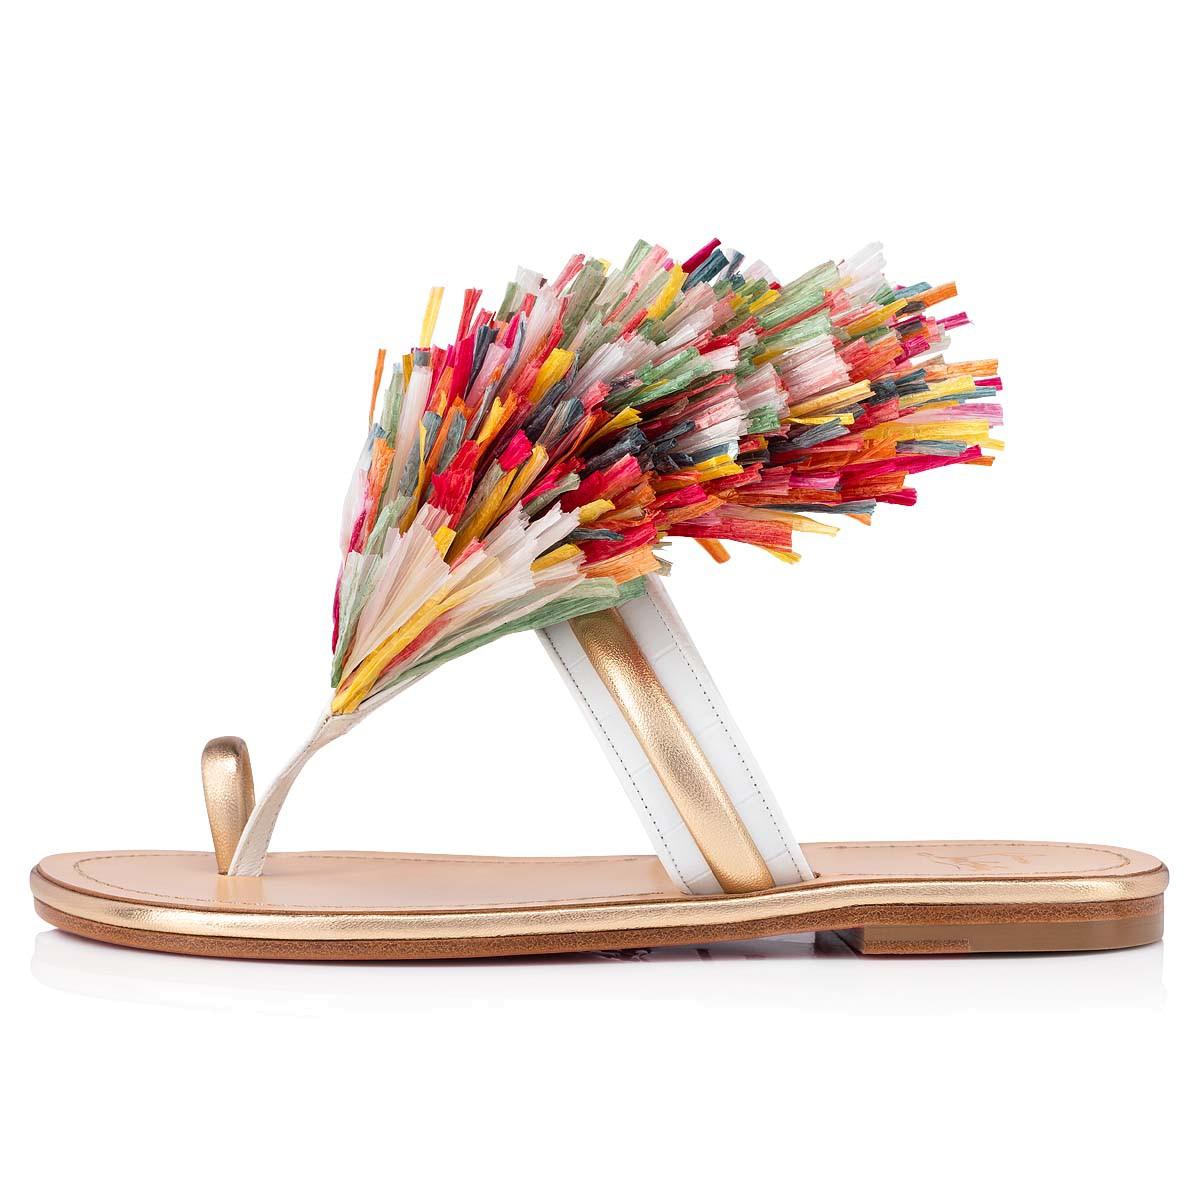 Shoes - Festividade Flat - Christian Louboutin